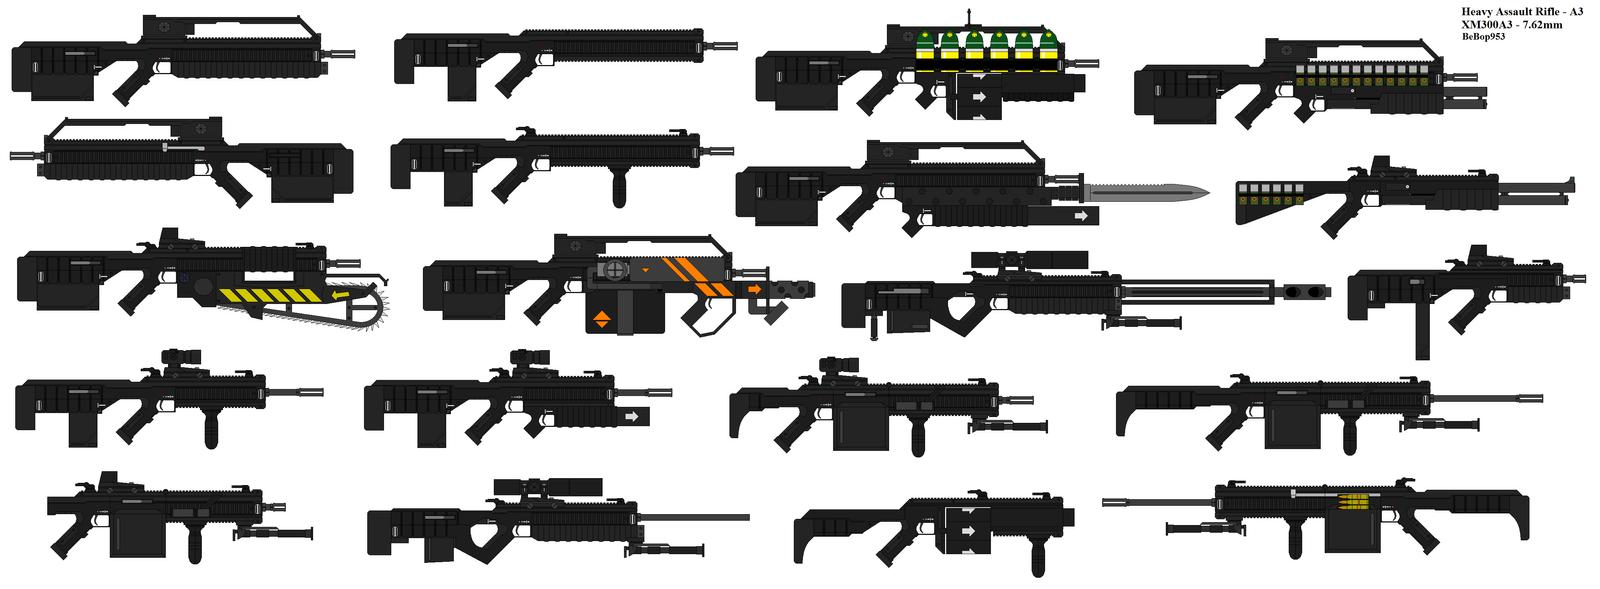 3d Animation Equipment List